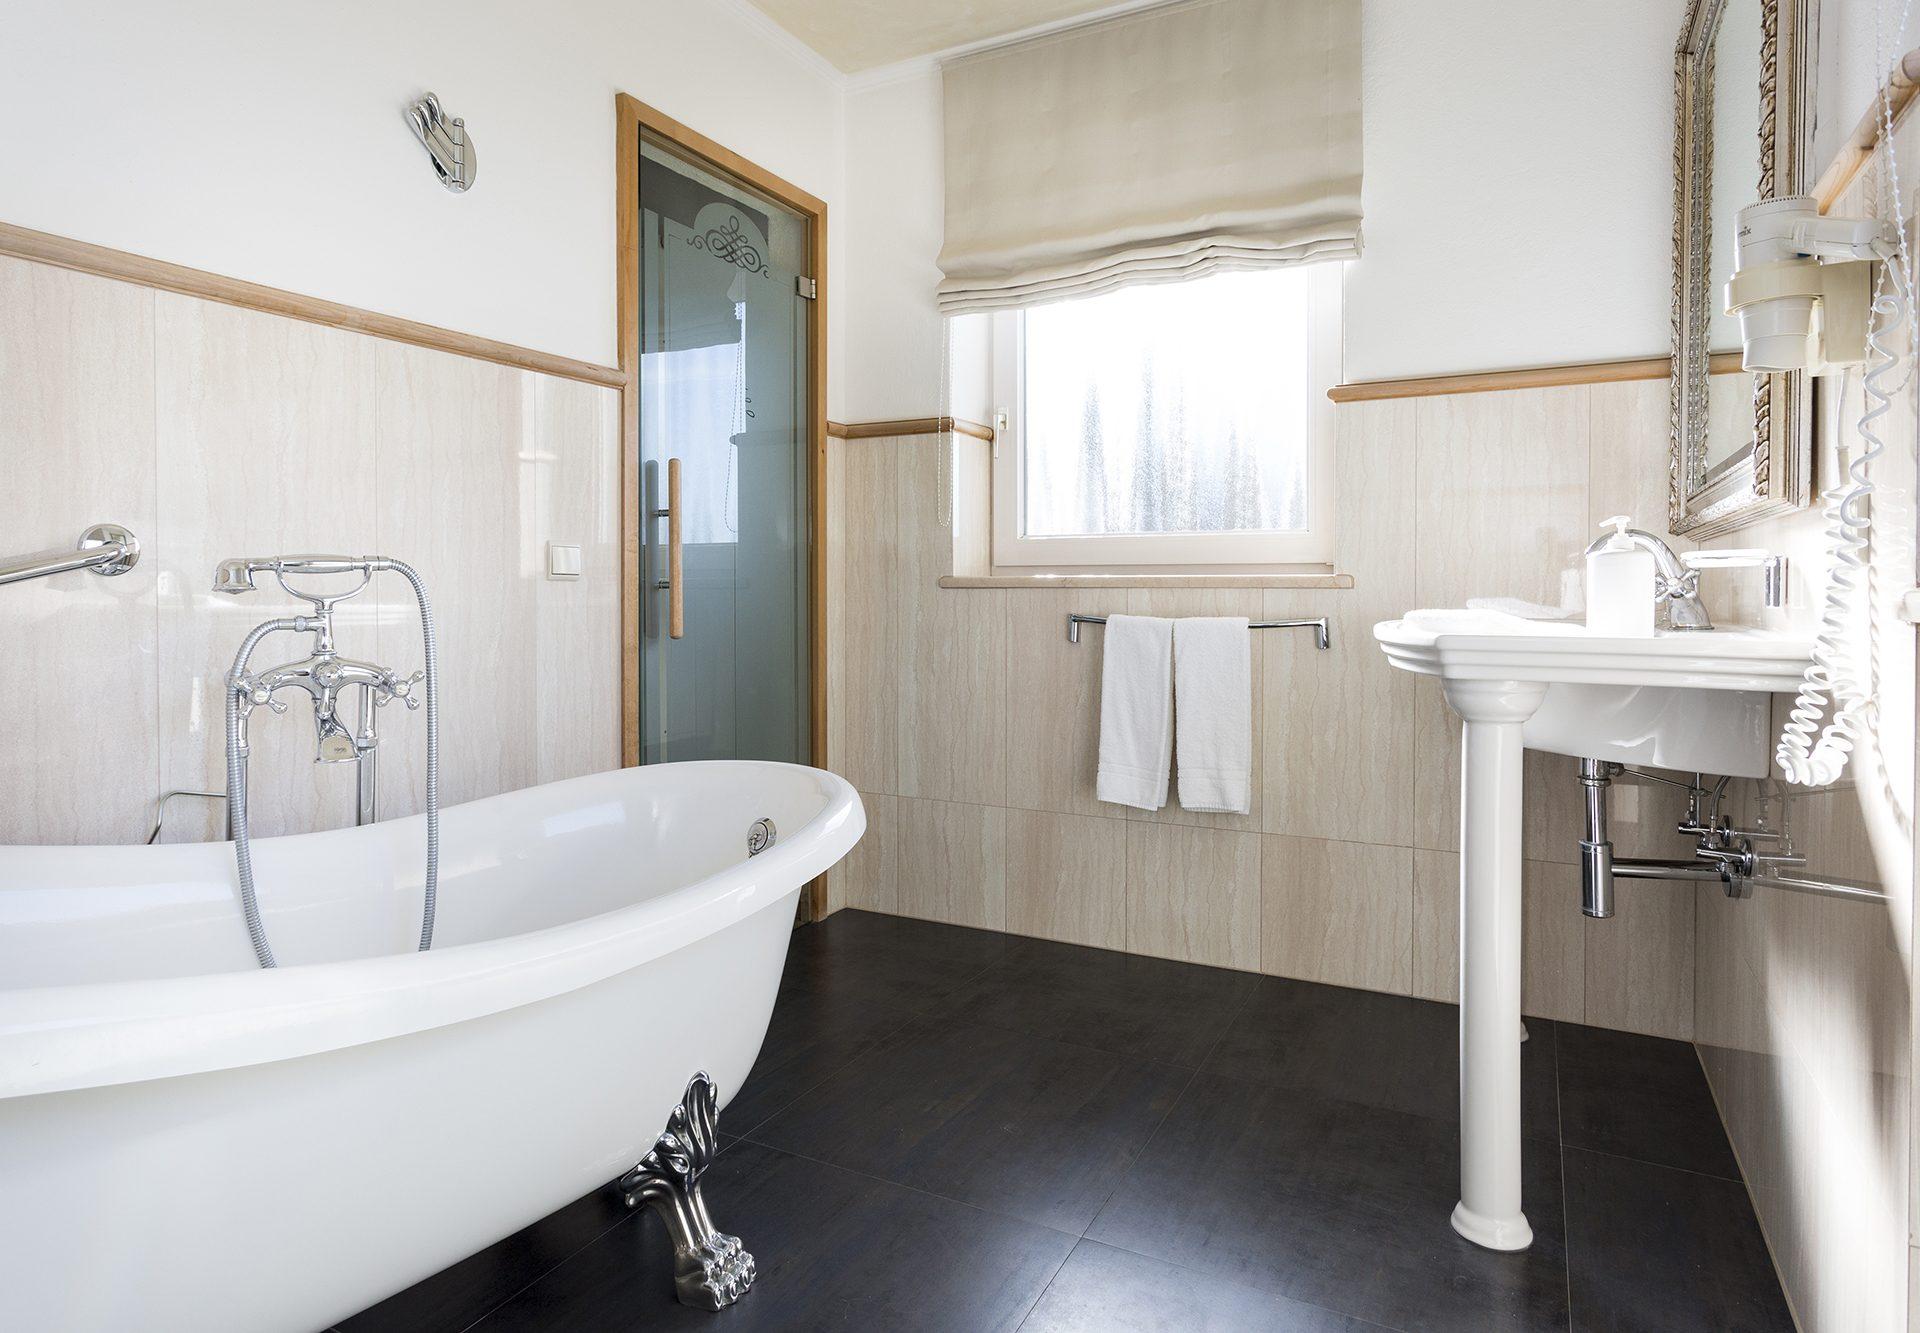 camera standard camera-bagno-vasca da bagno